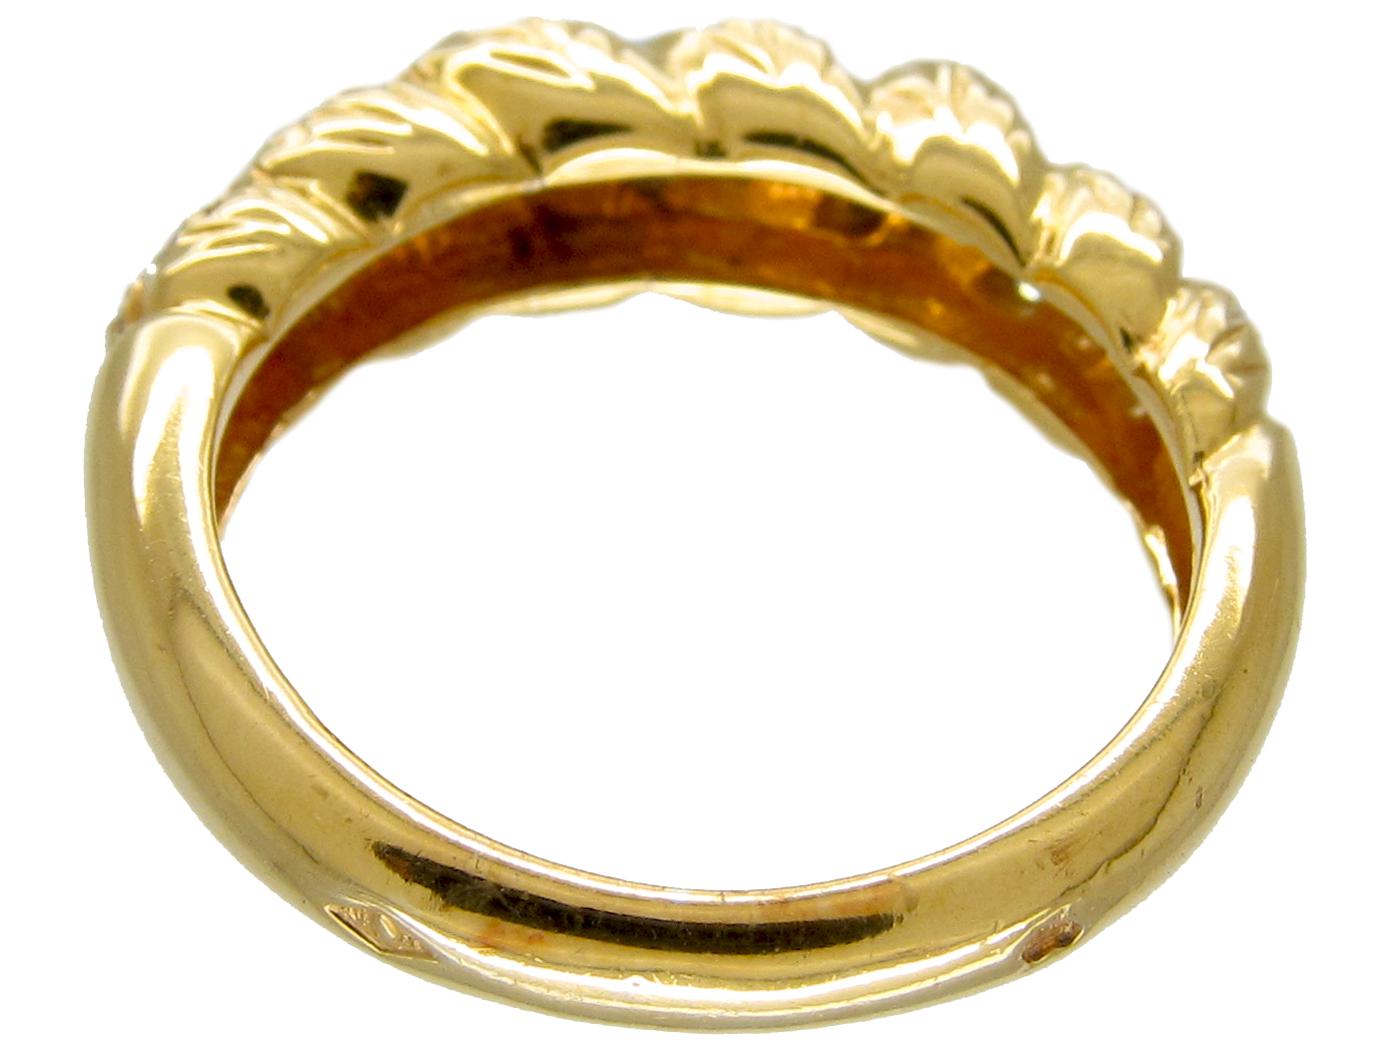 Cartier 18ct Gold Twist Diamond Set Ring in Original Case